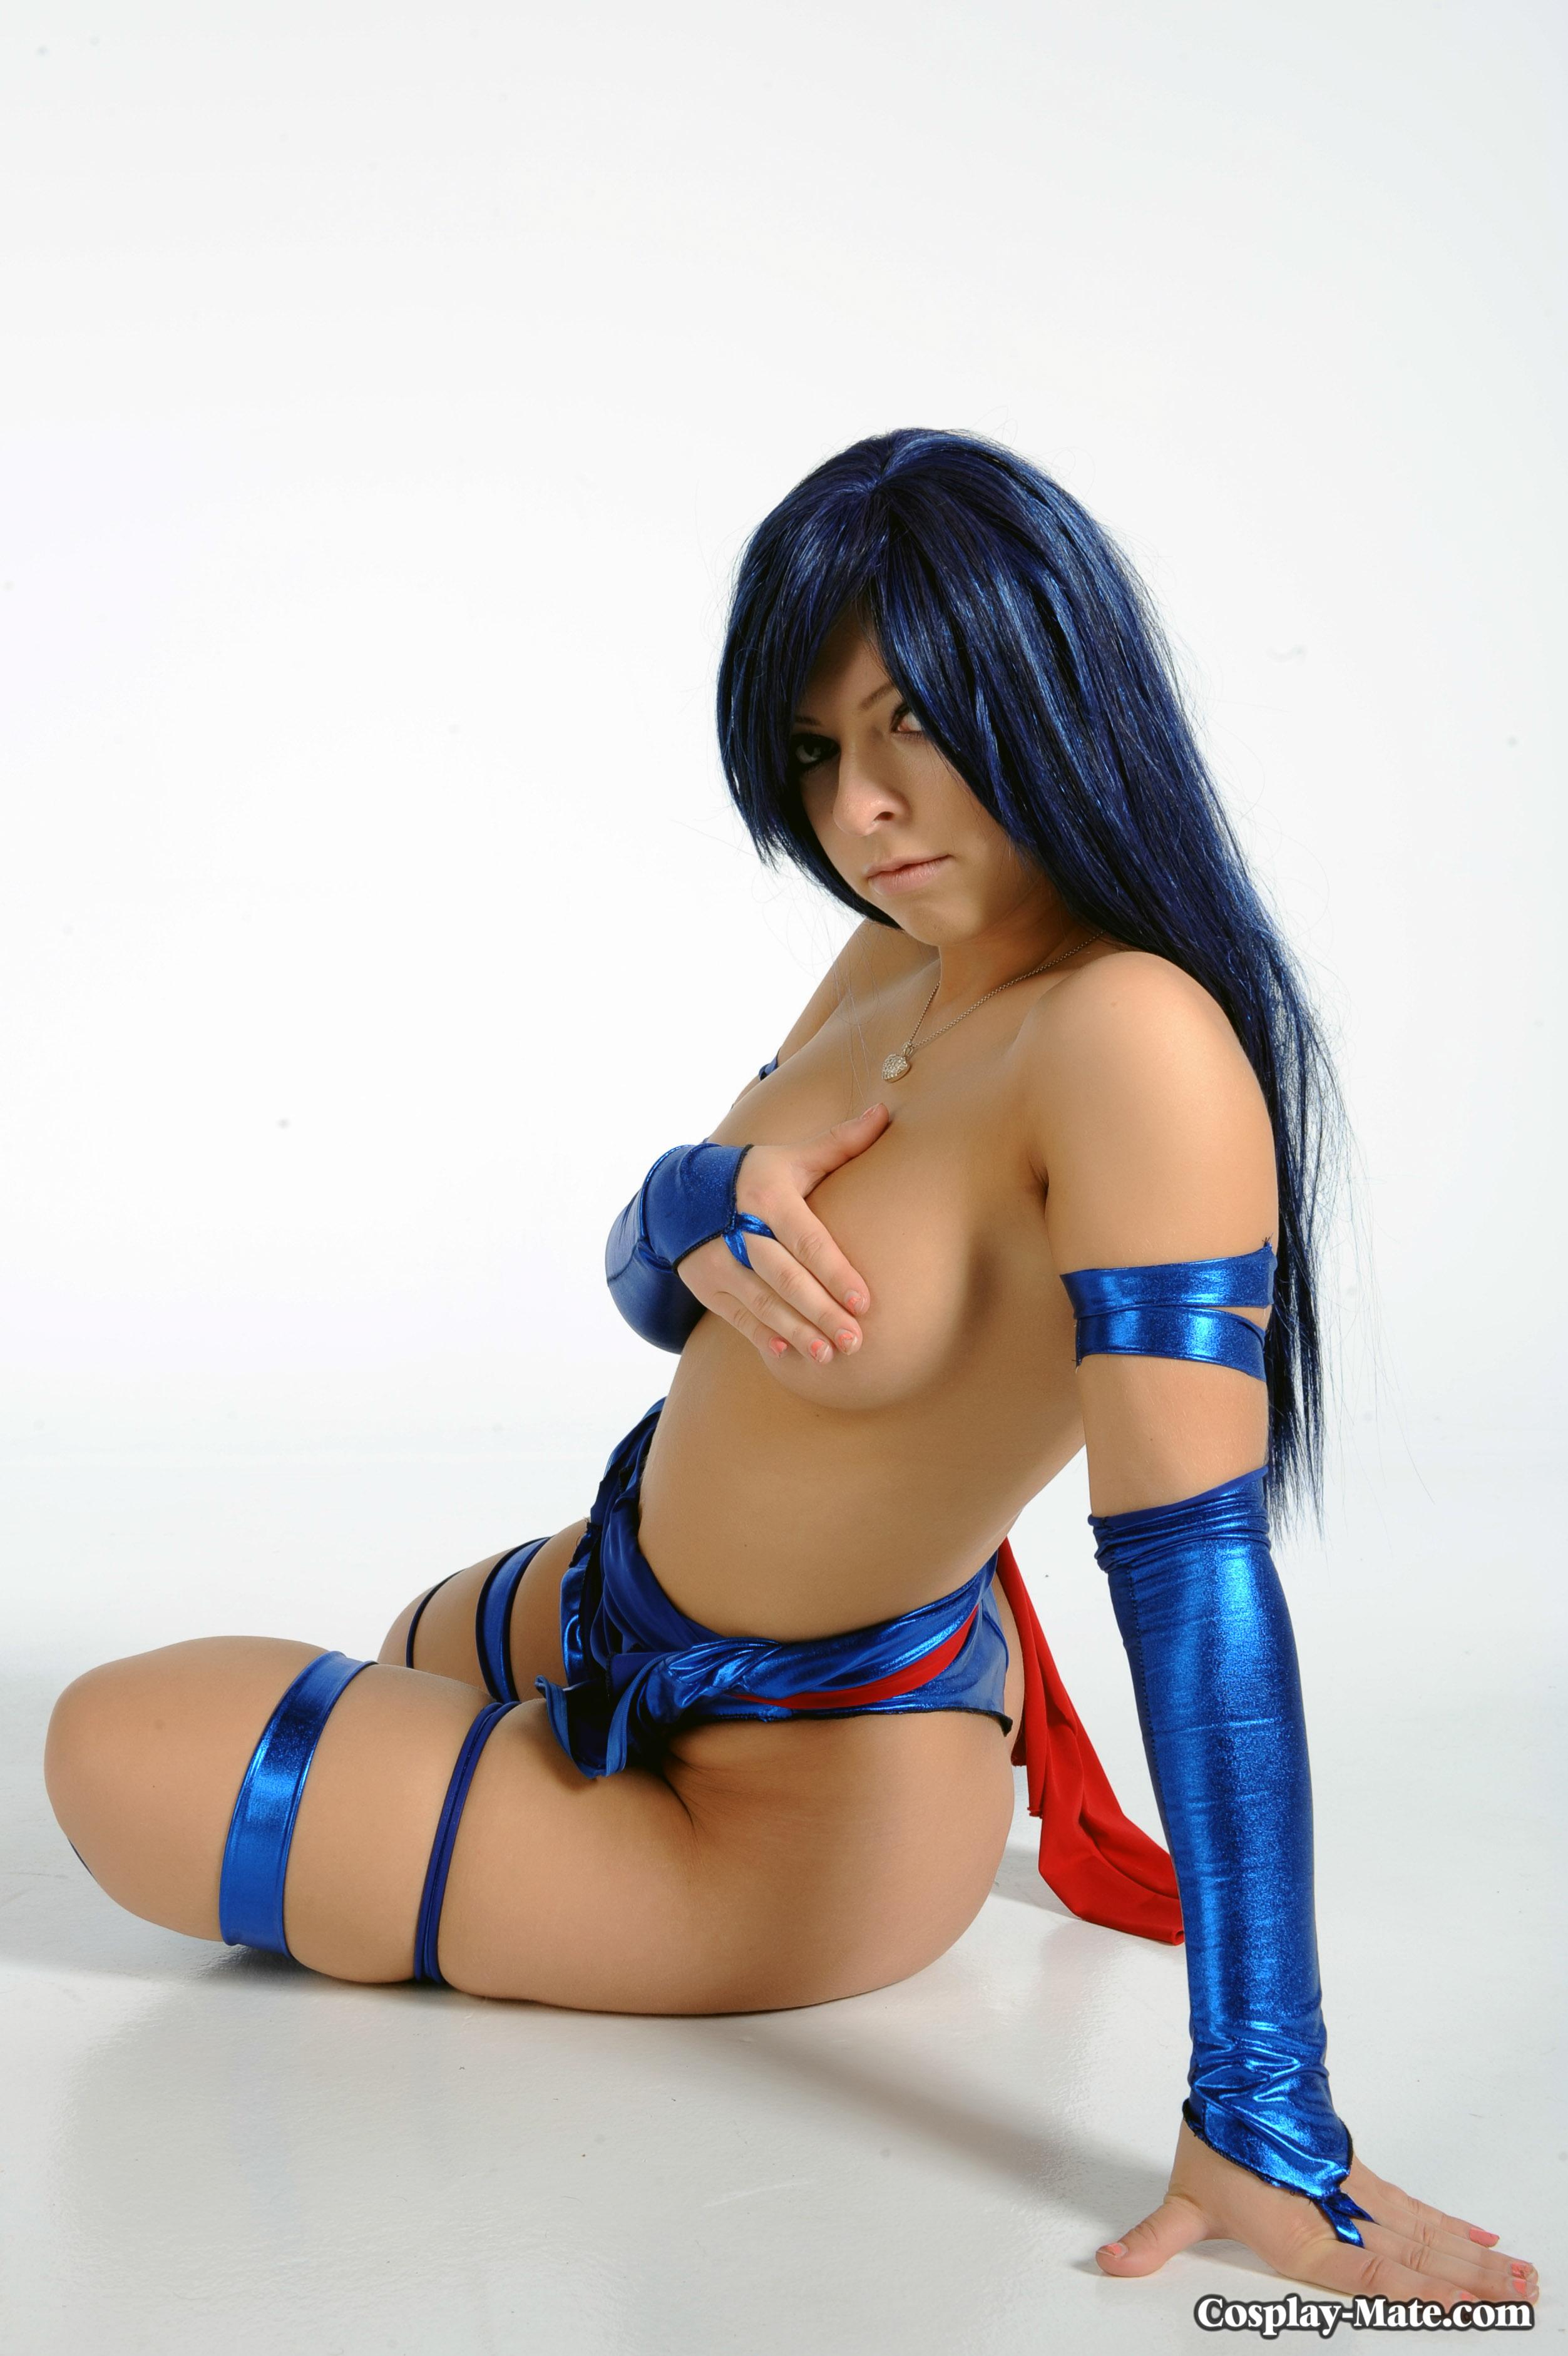 big floppy boobs nudes